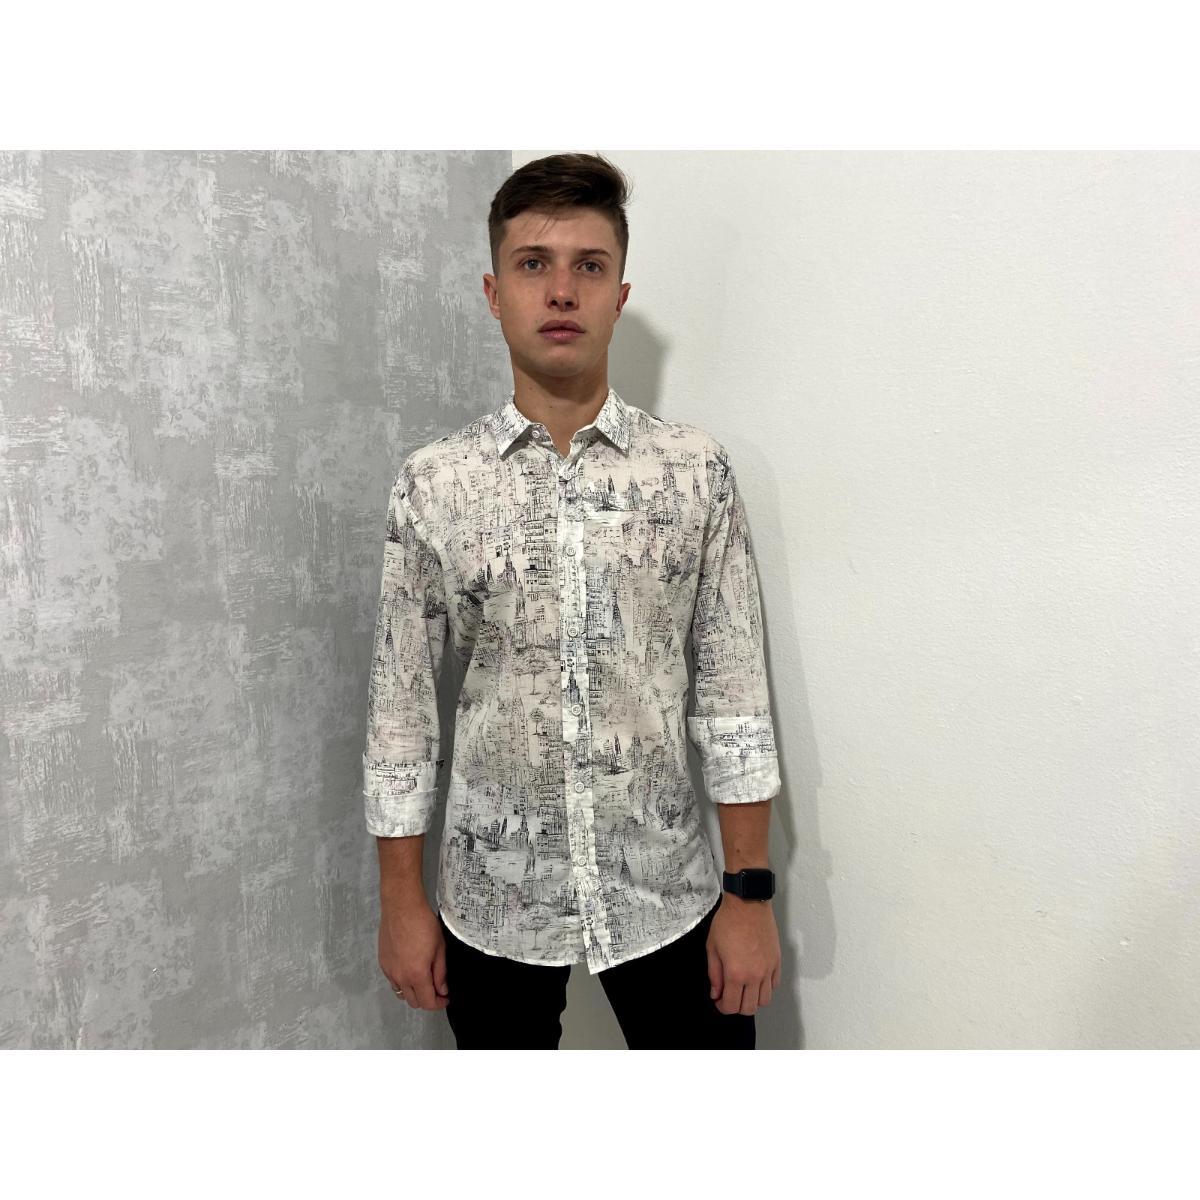 Camisa Masculina Colcci   310103498 Vc41 Off White/preto